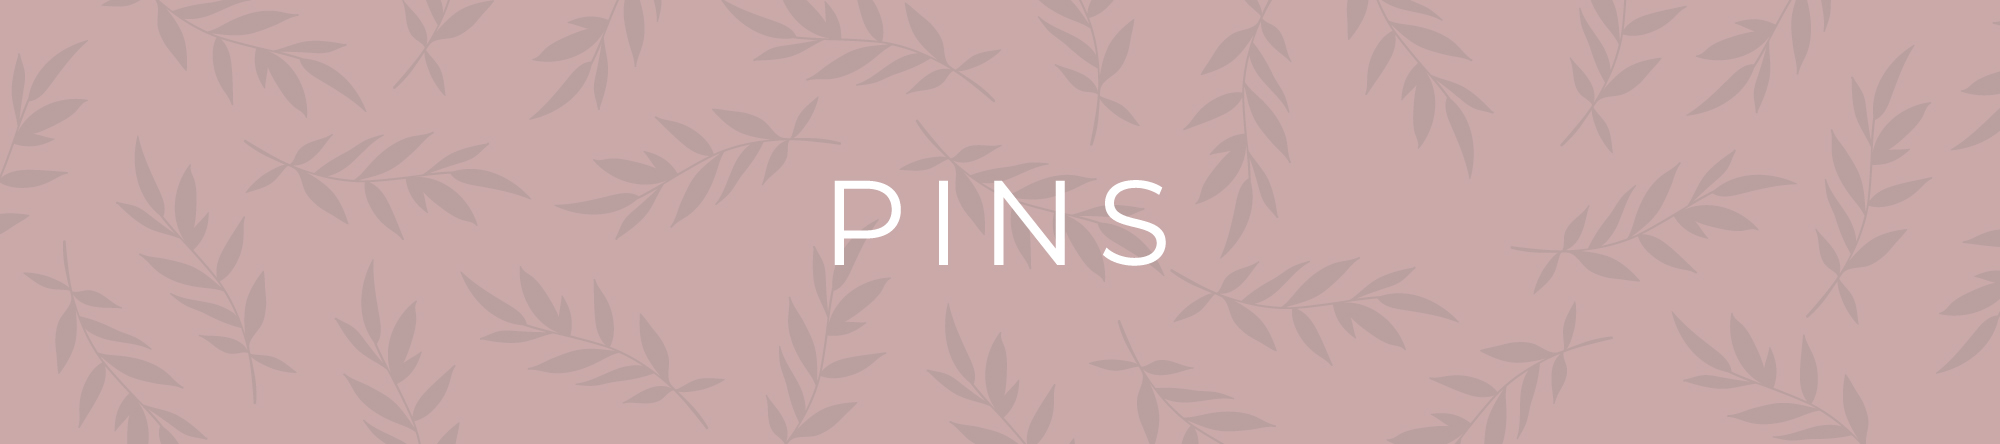 PinsBanner.jpg